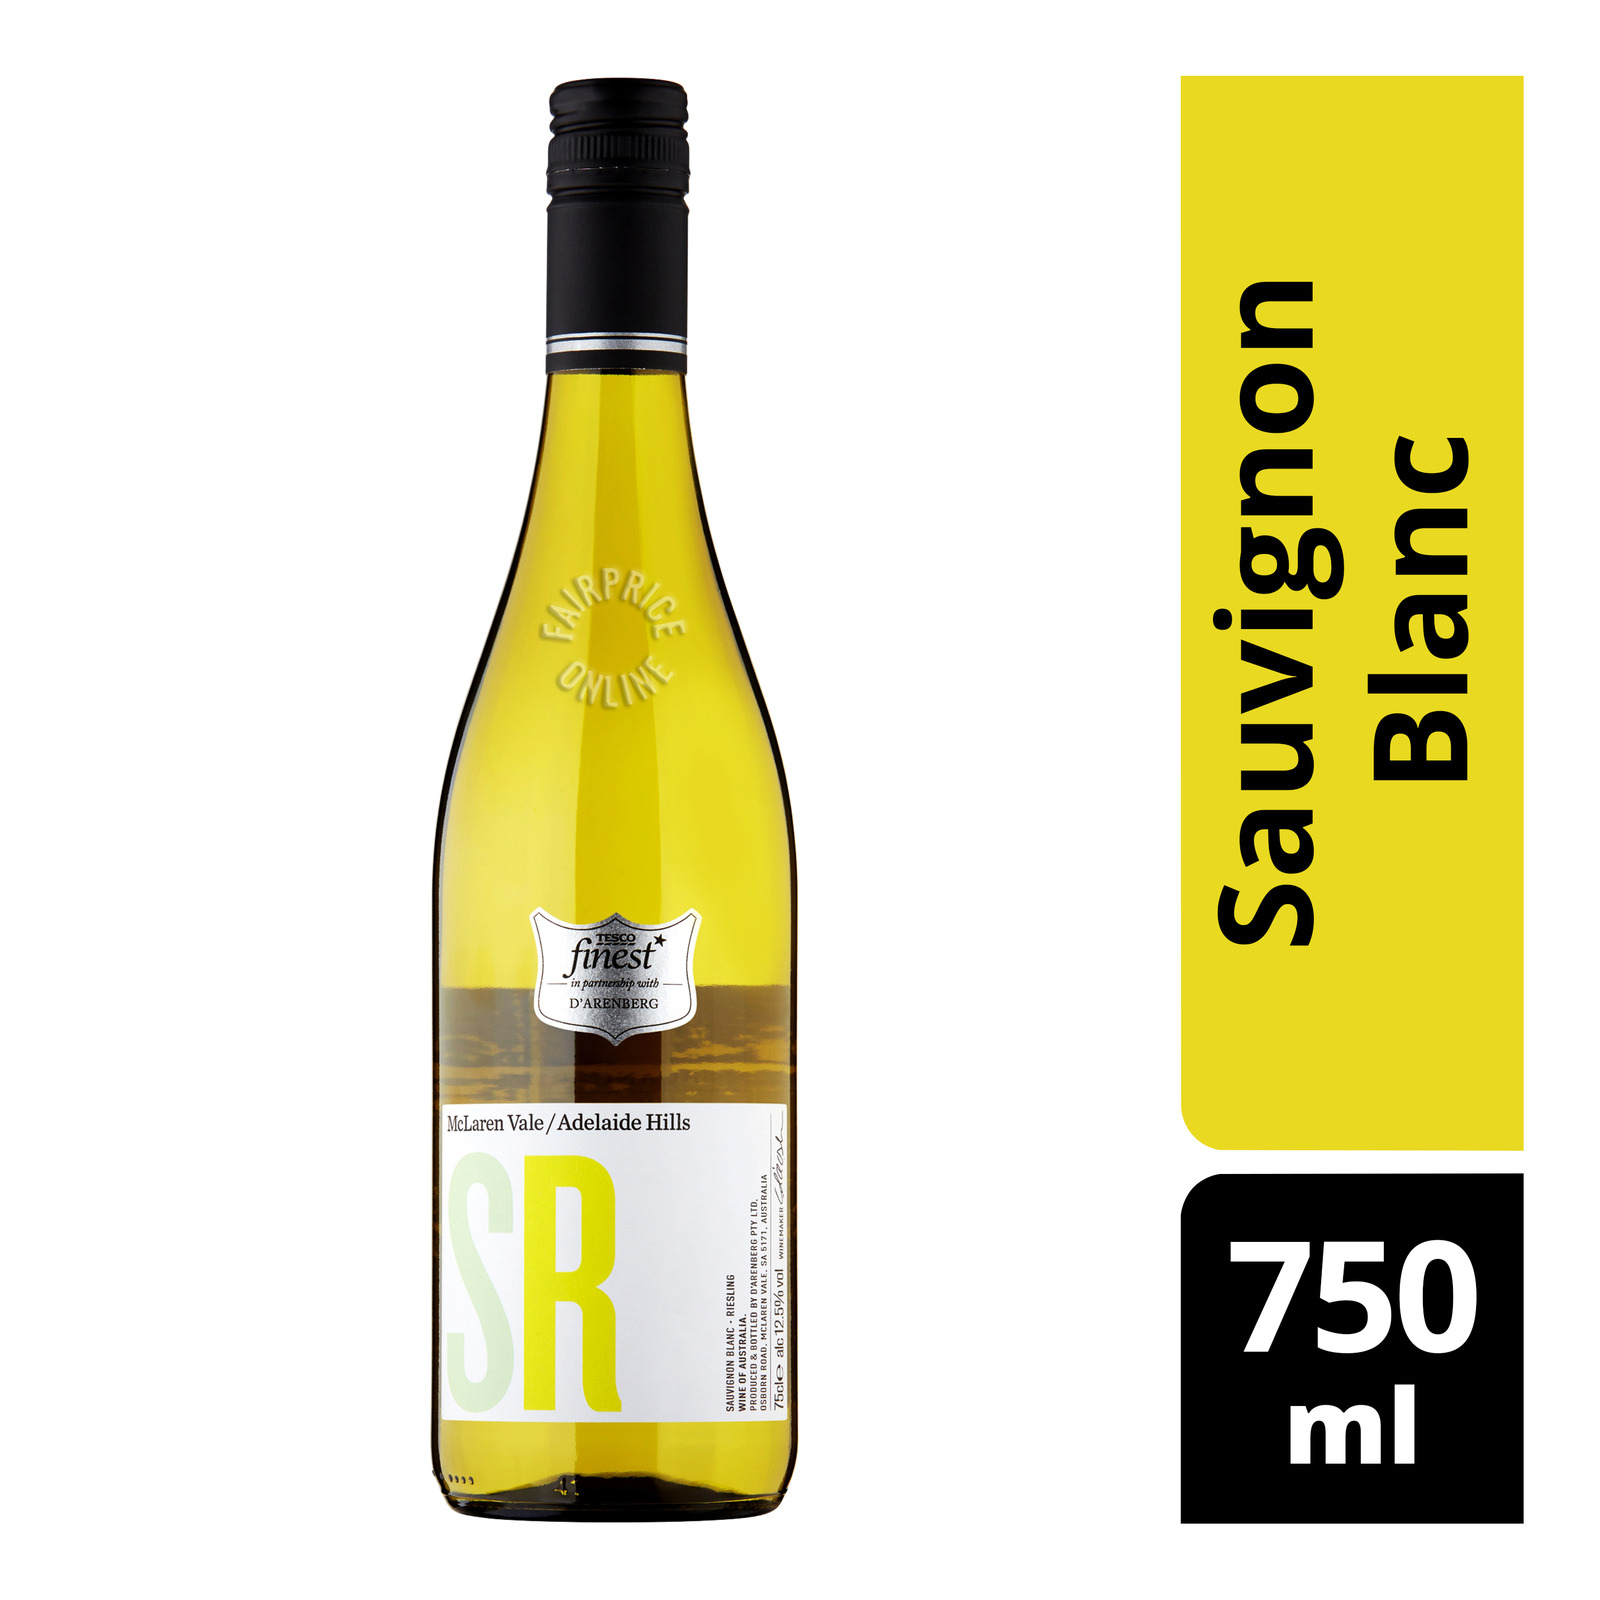 Tesco Finest White Wine - Sauvignon Blanc